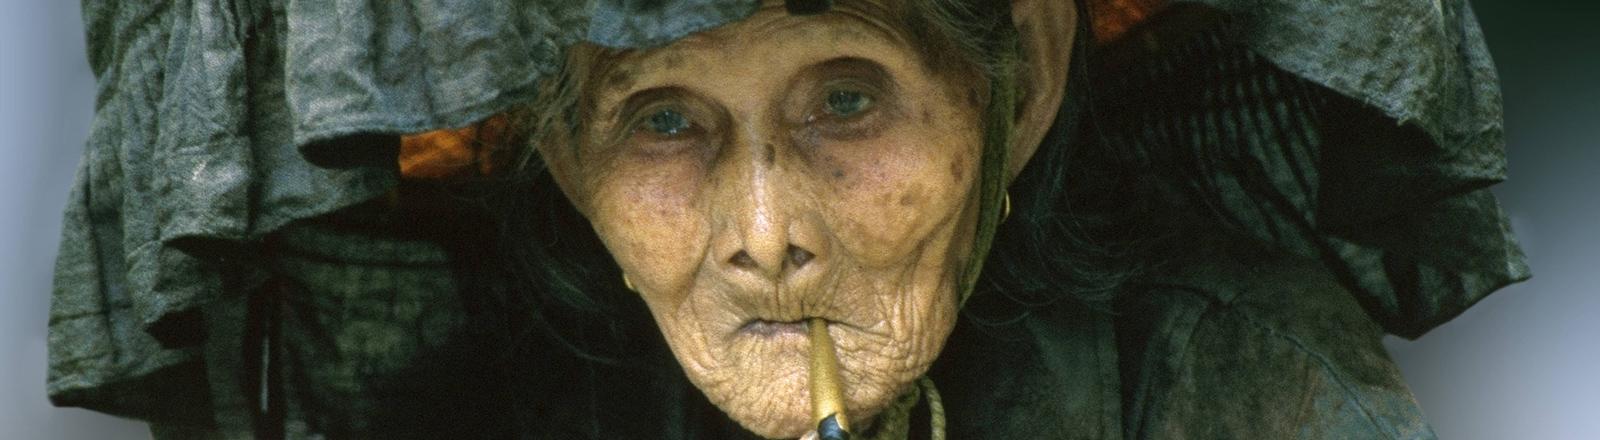 Uralte Hakka-Frau raucht Opium-Pfeife, China, Hongkong.